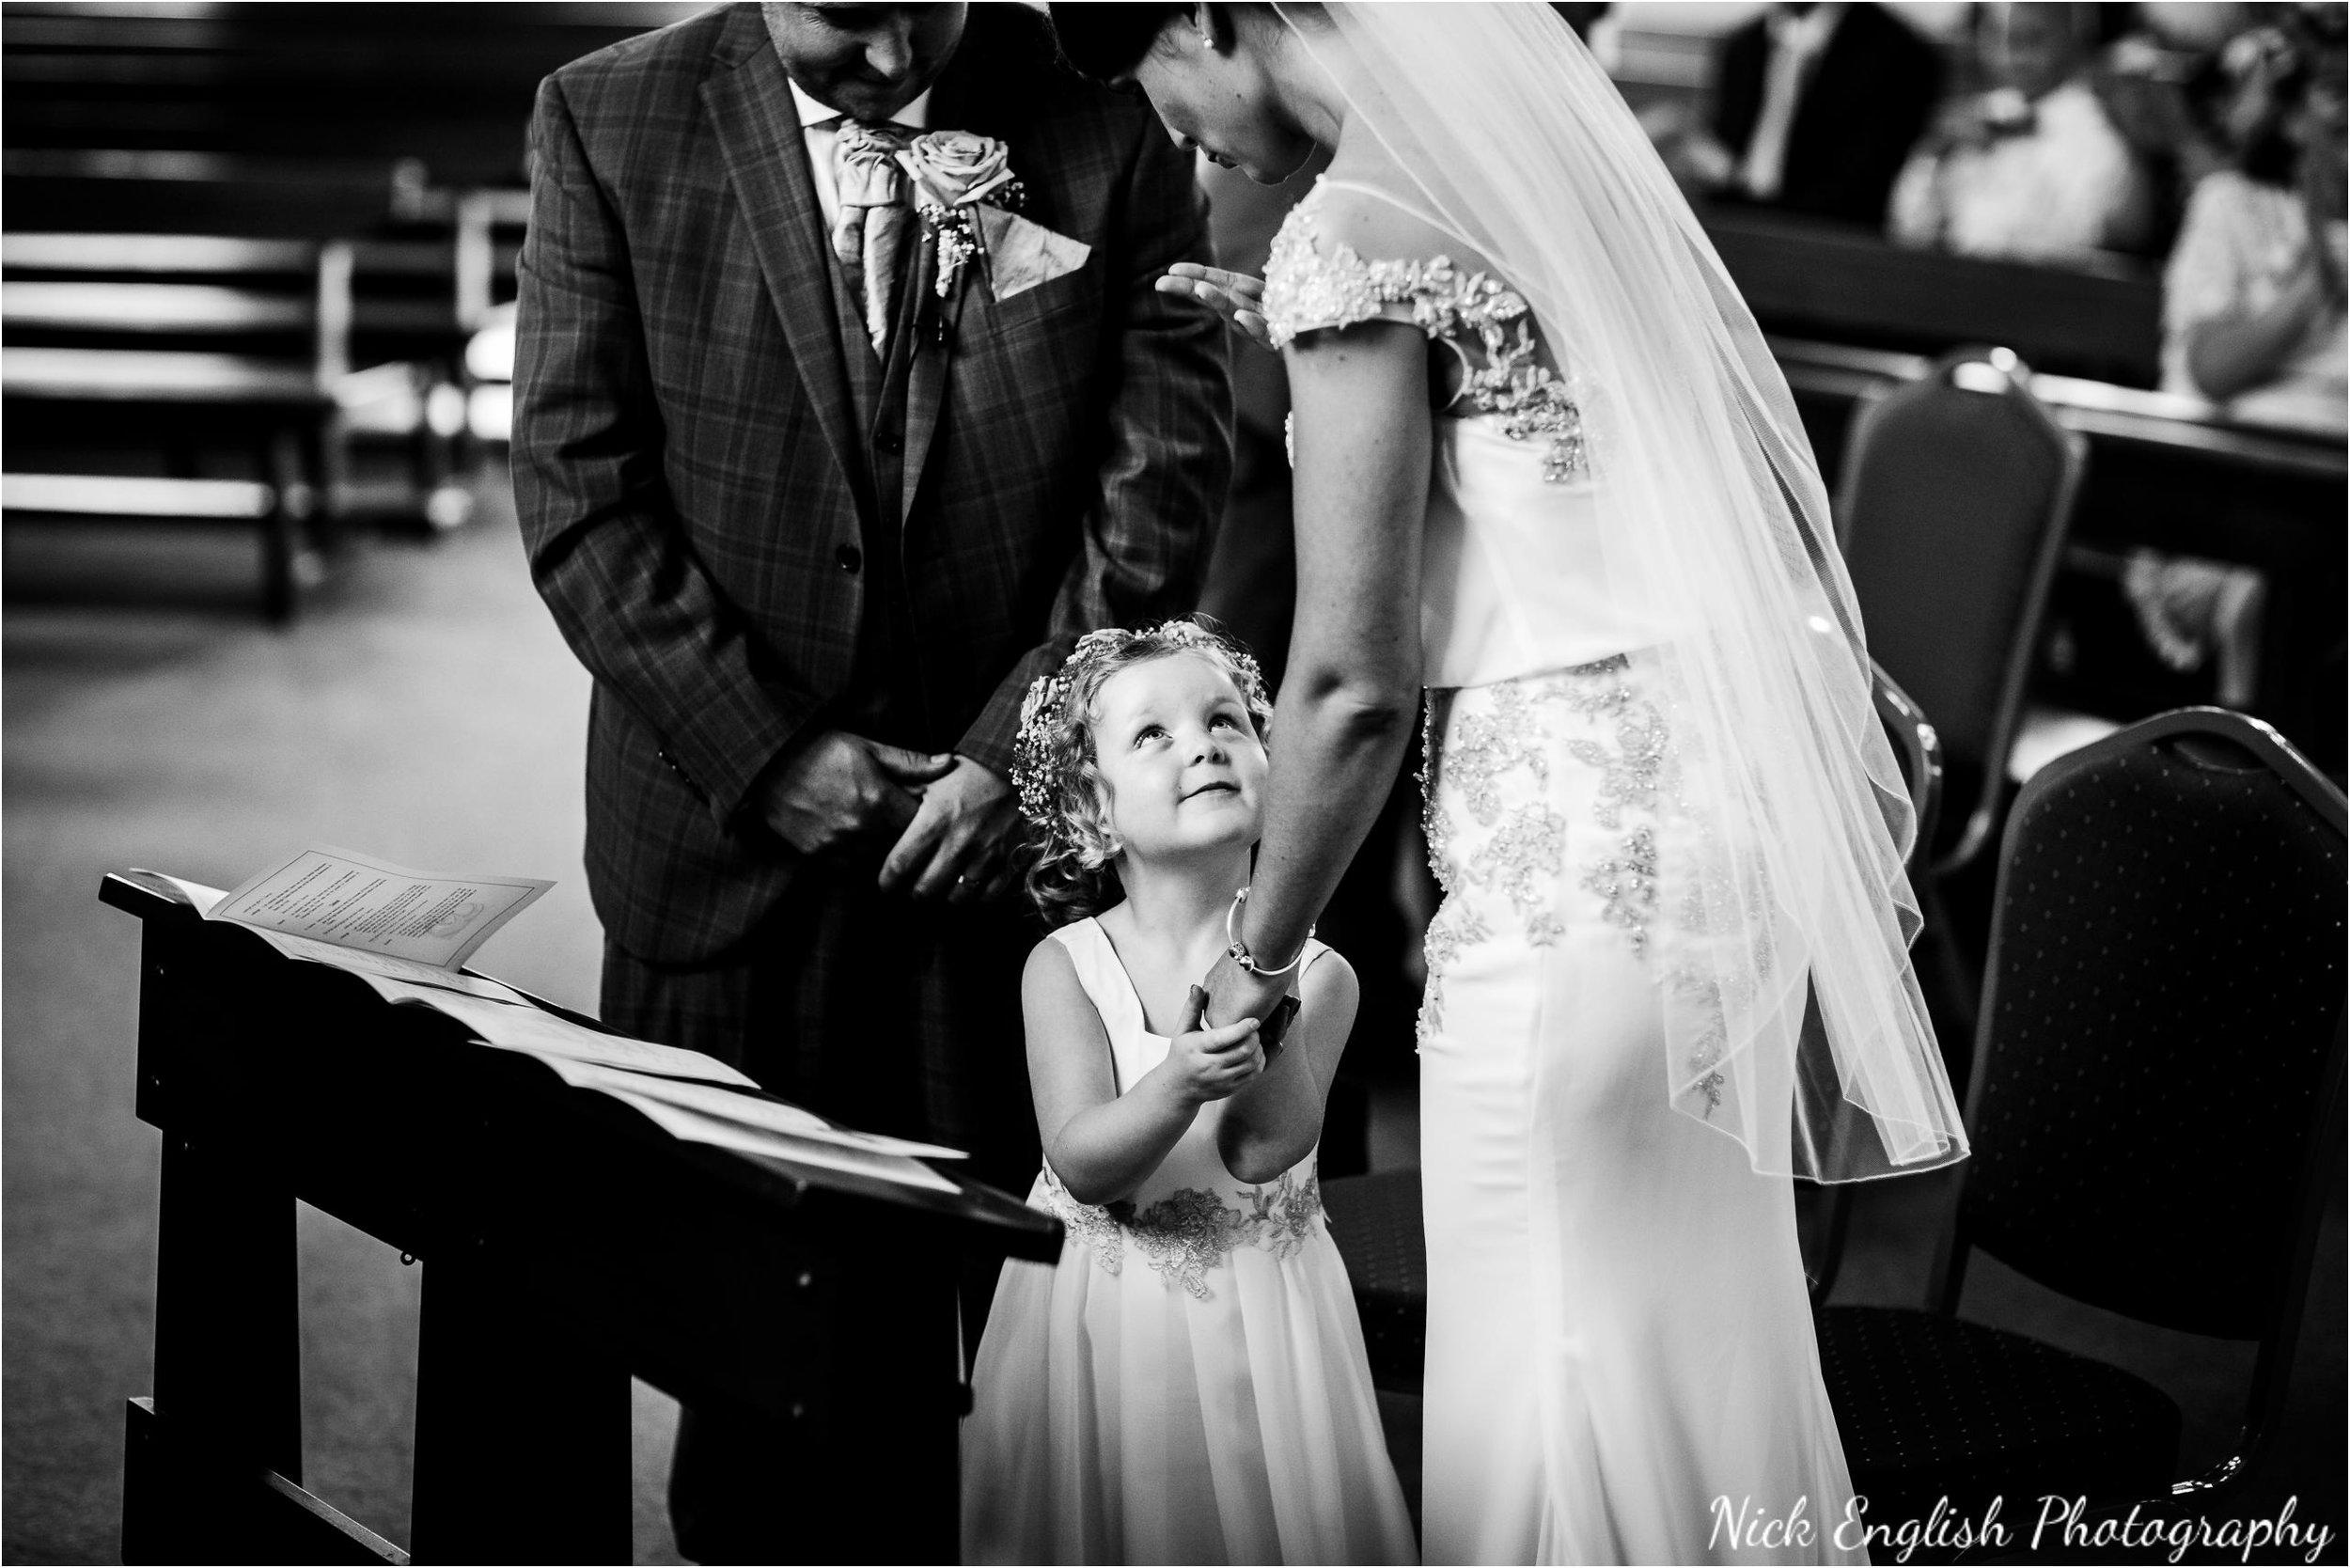 Stacey-Ash-Wedding-Photographs-Stanley-House-Preston-Lancashire-69.jpg